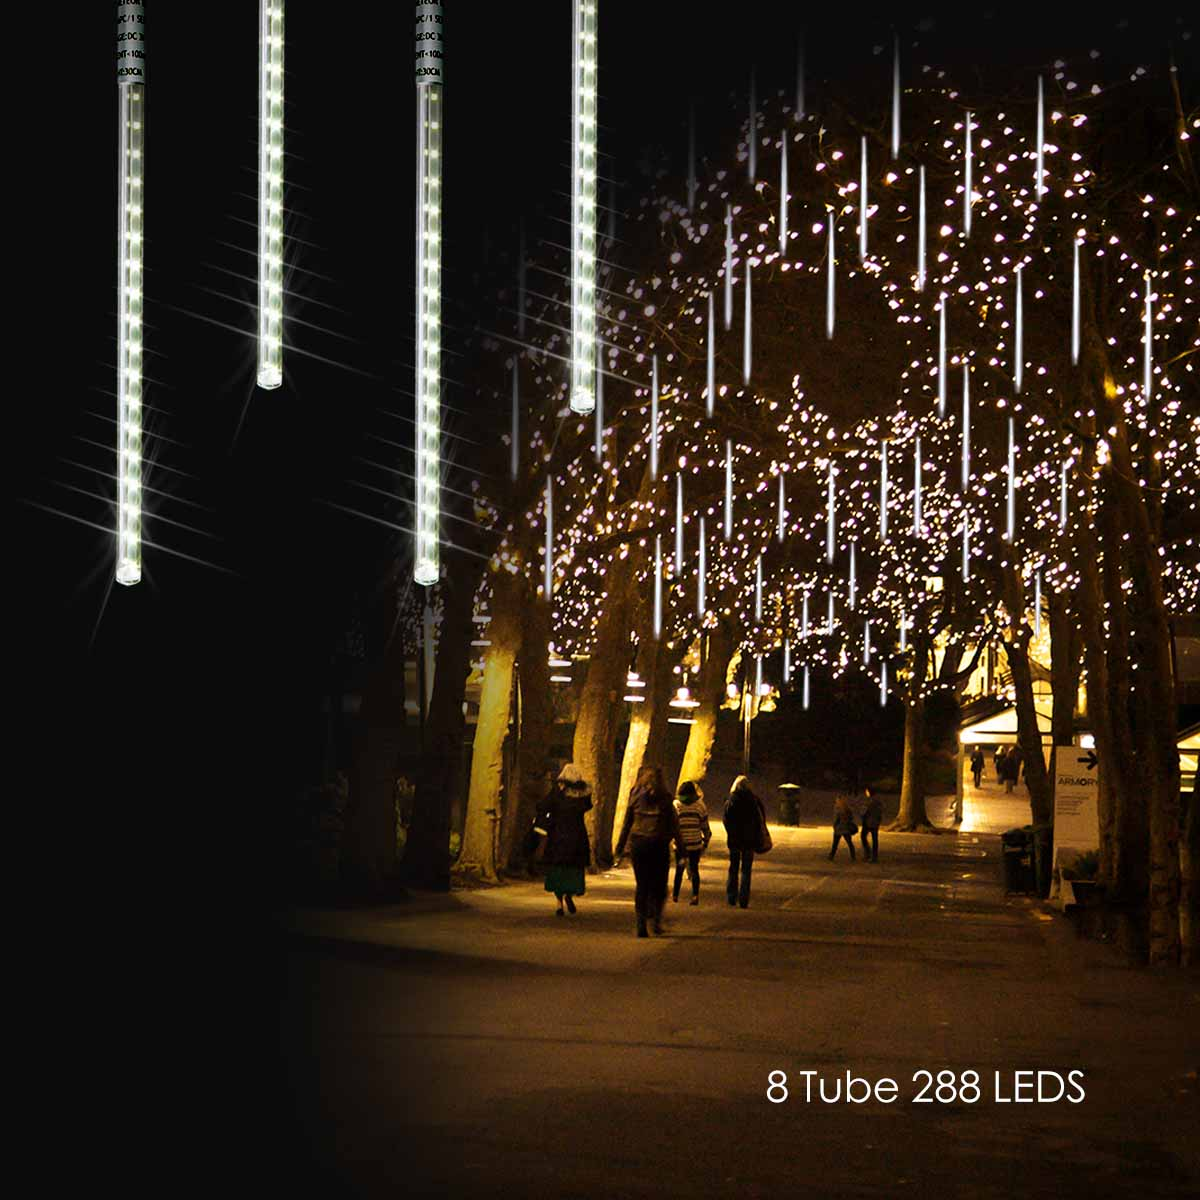 Solar Powered LED Outdoor Lights Meteor Shower Rain Lights Icicle Raindrop Snow Falling Lights Garden Holiday Wedding Decoration